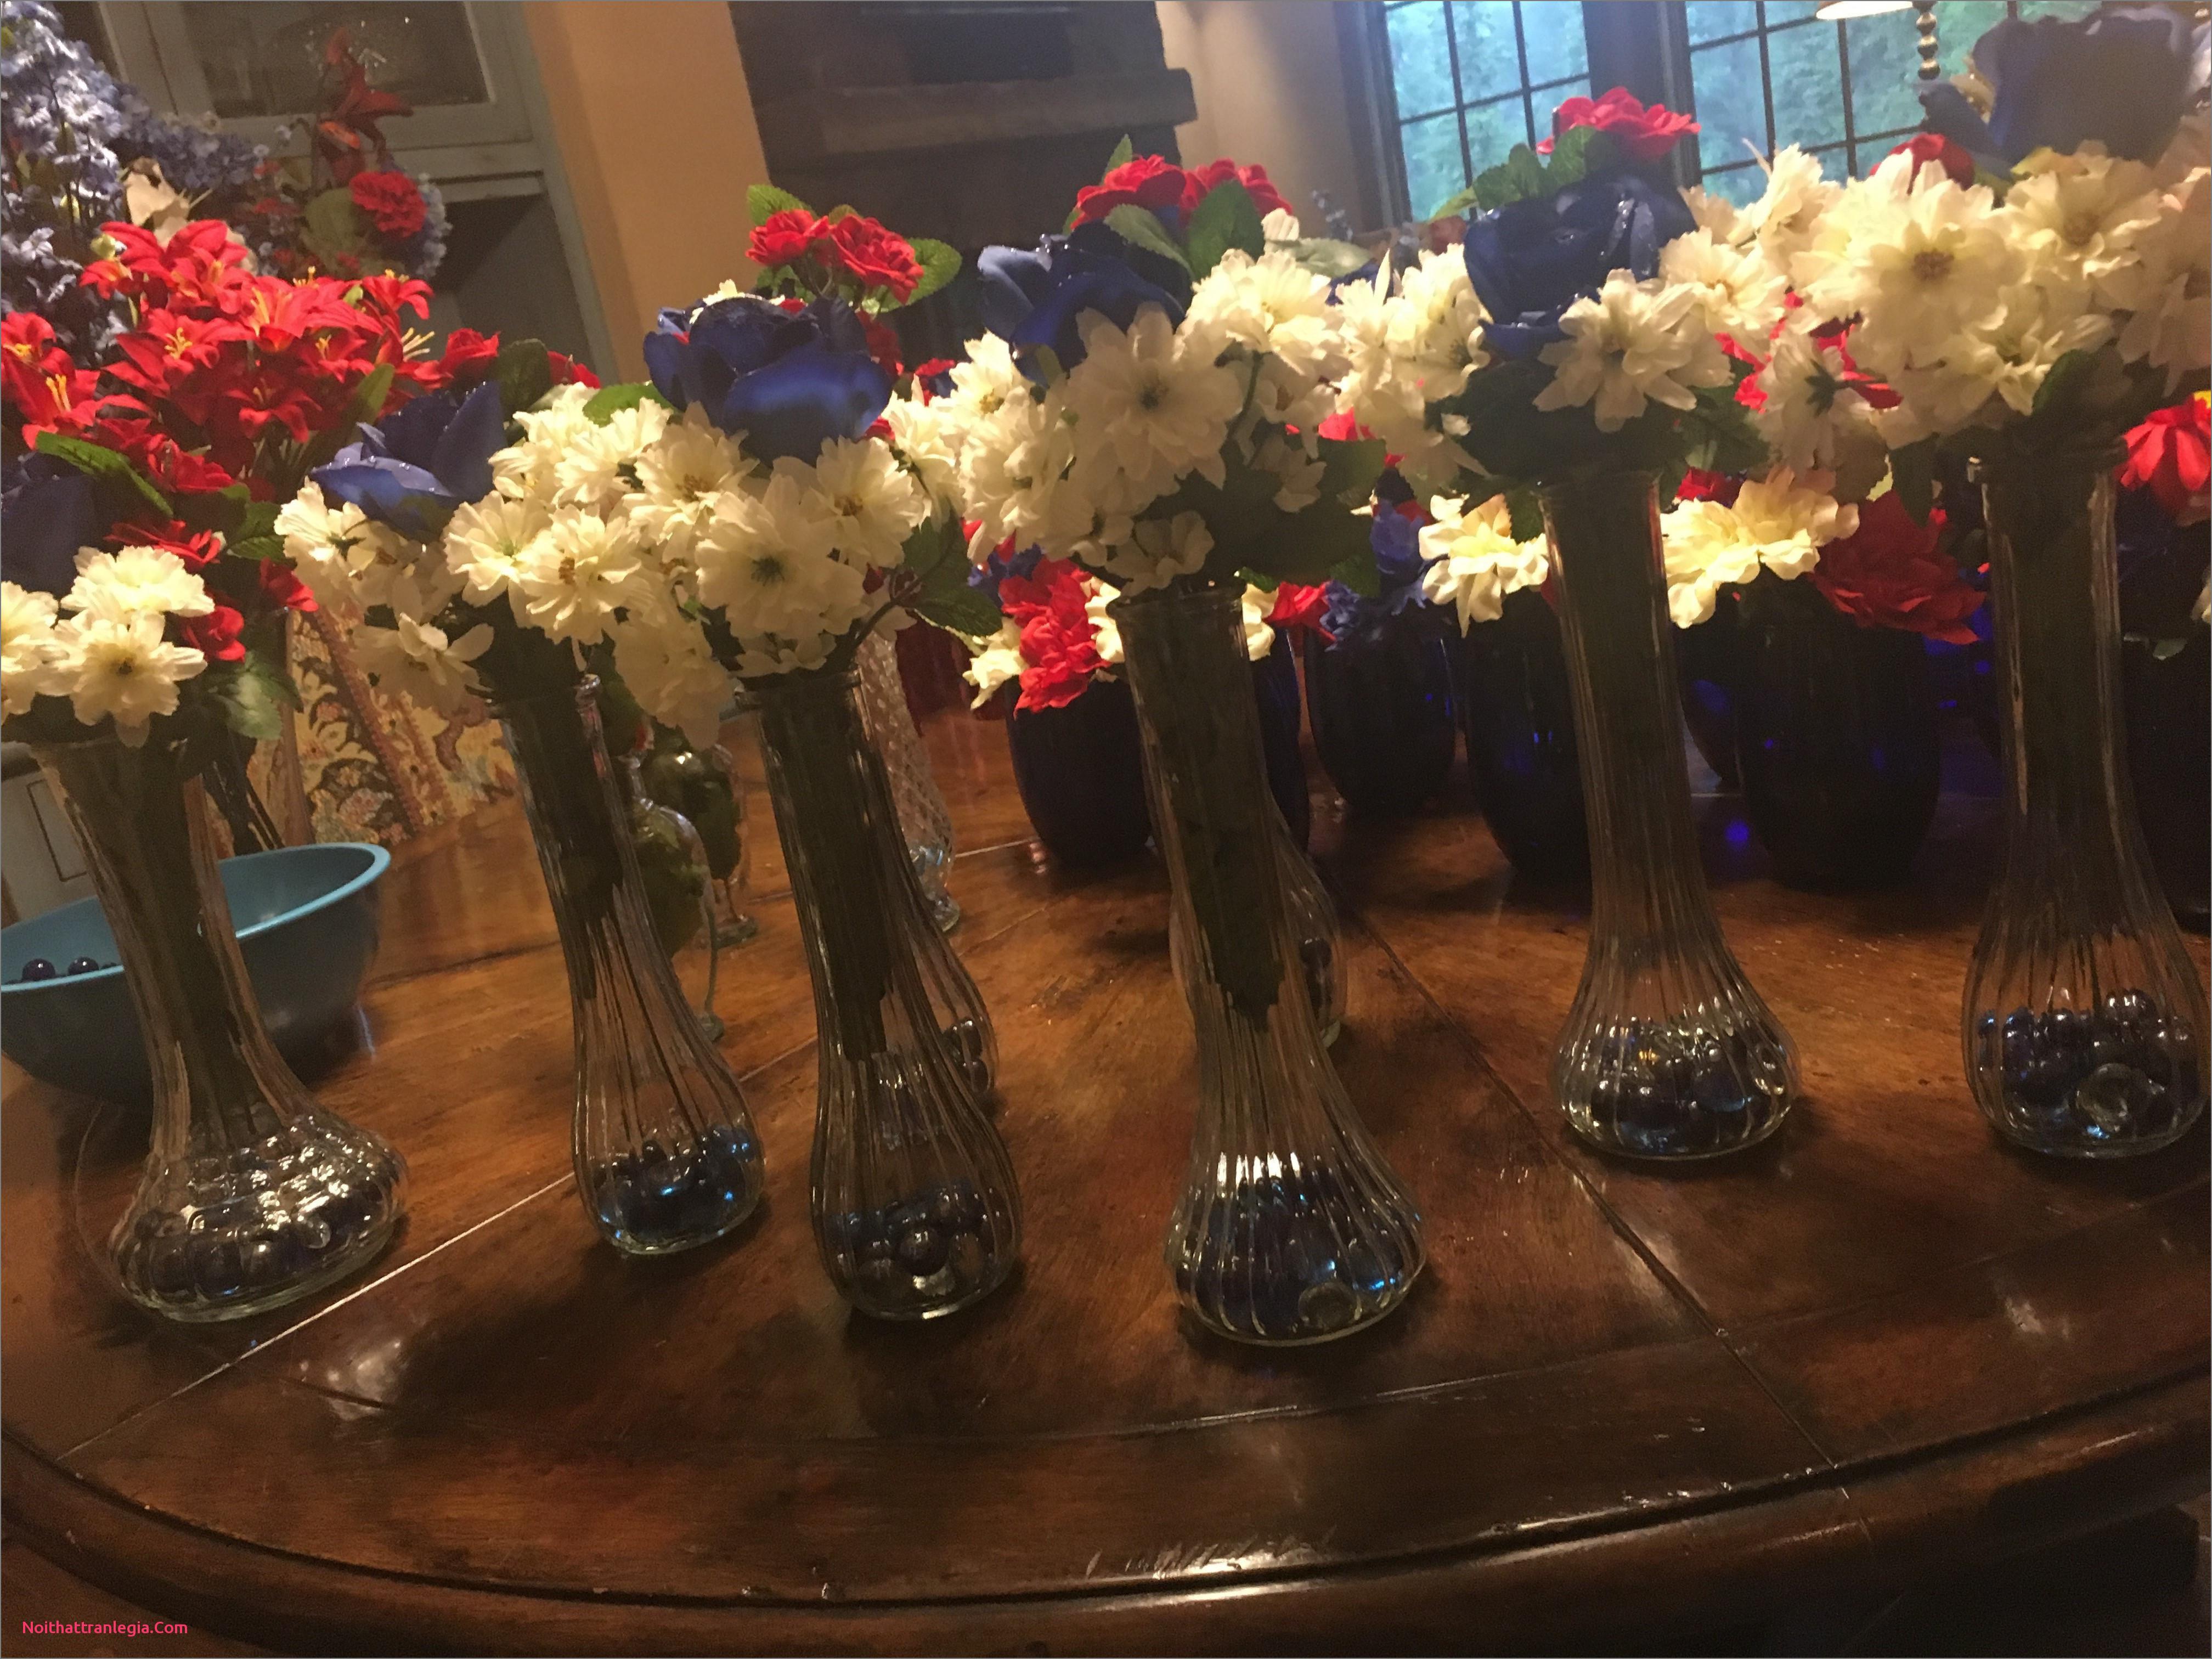 cheap white bud vases of 20 how to clean flower vases noithattranlegia vases design with diy wedding decoration ideas inspirational dollar tree wedding decorations awesome h vases dollar vas